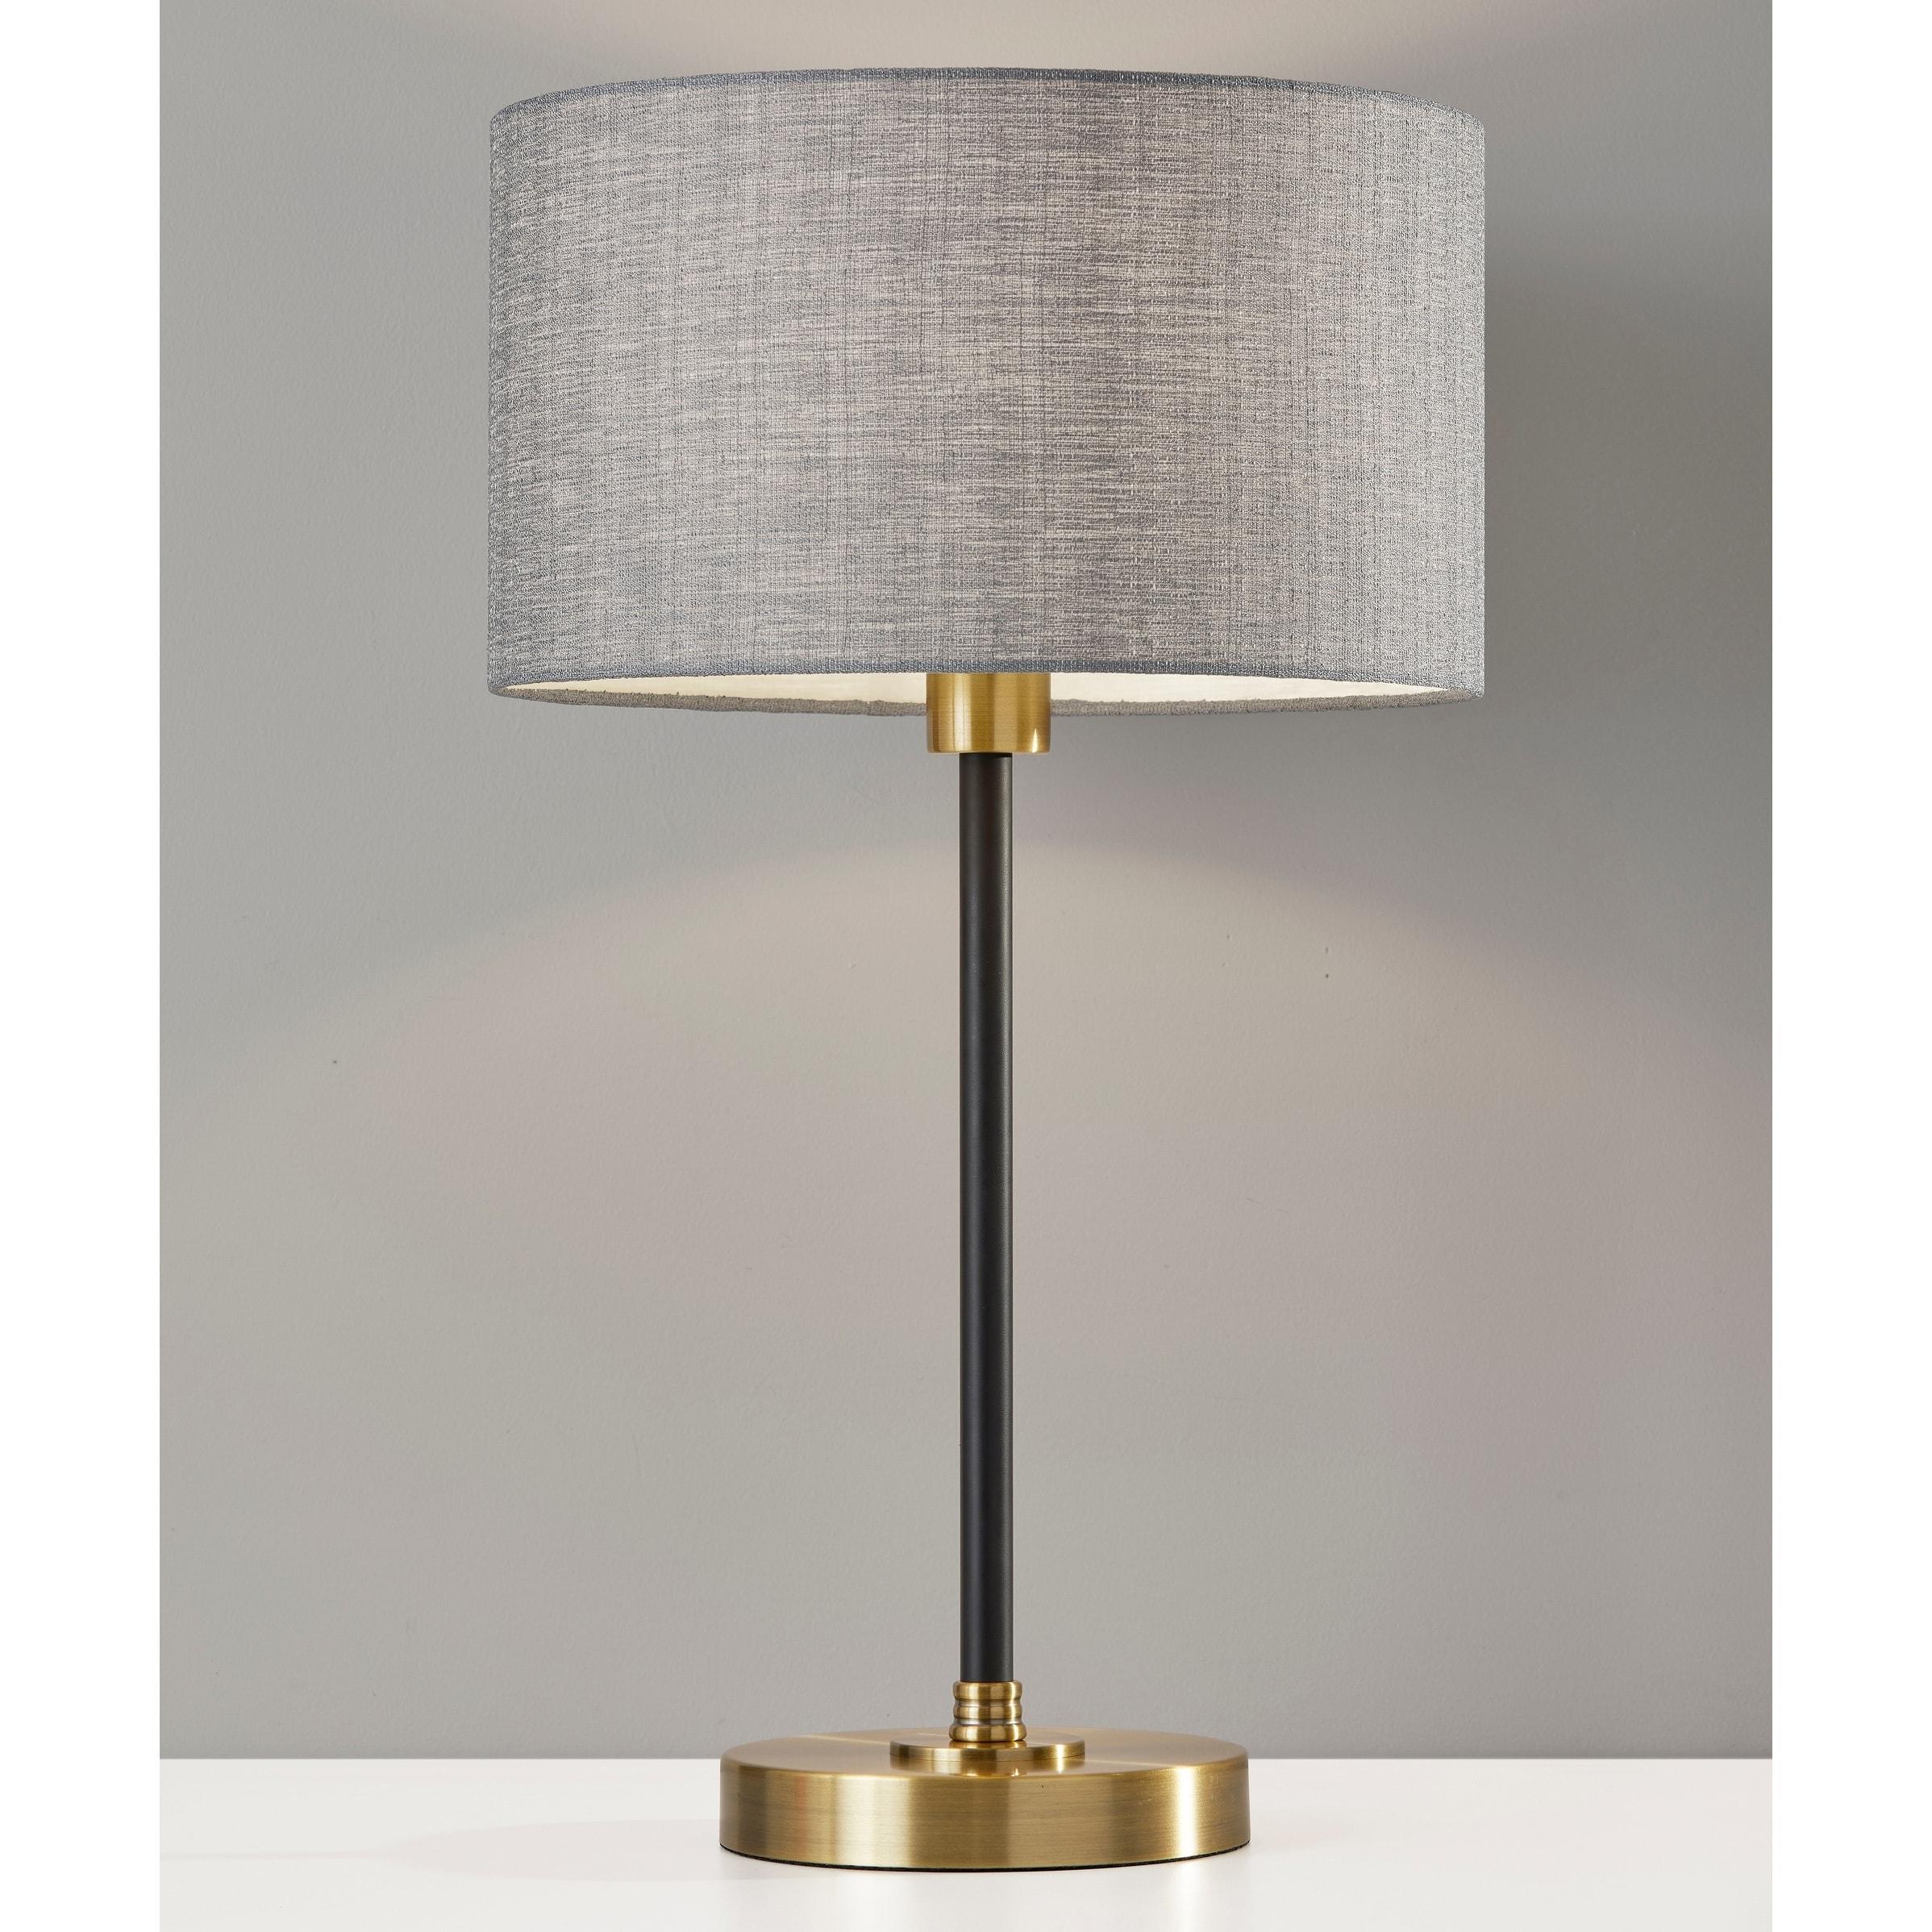 Shop Black Friday Deals On Carson Carrington Parteby Black Antique Brass Table Lamp Overstock 30266067